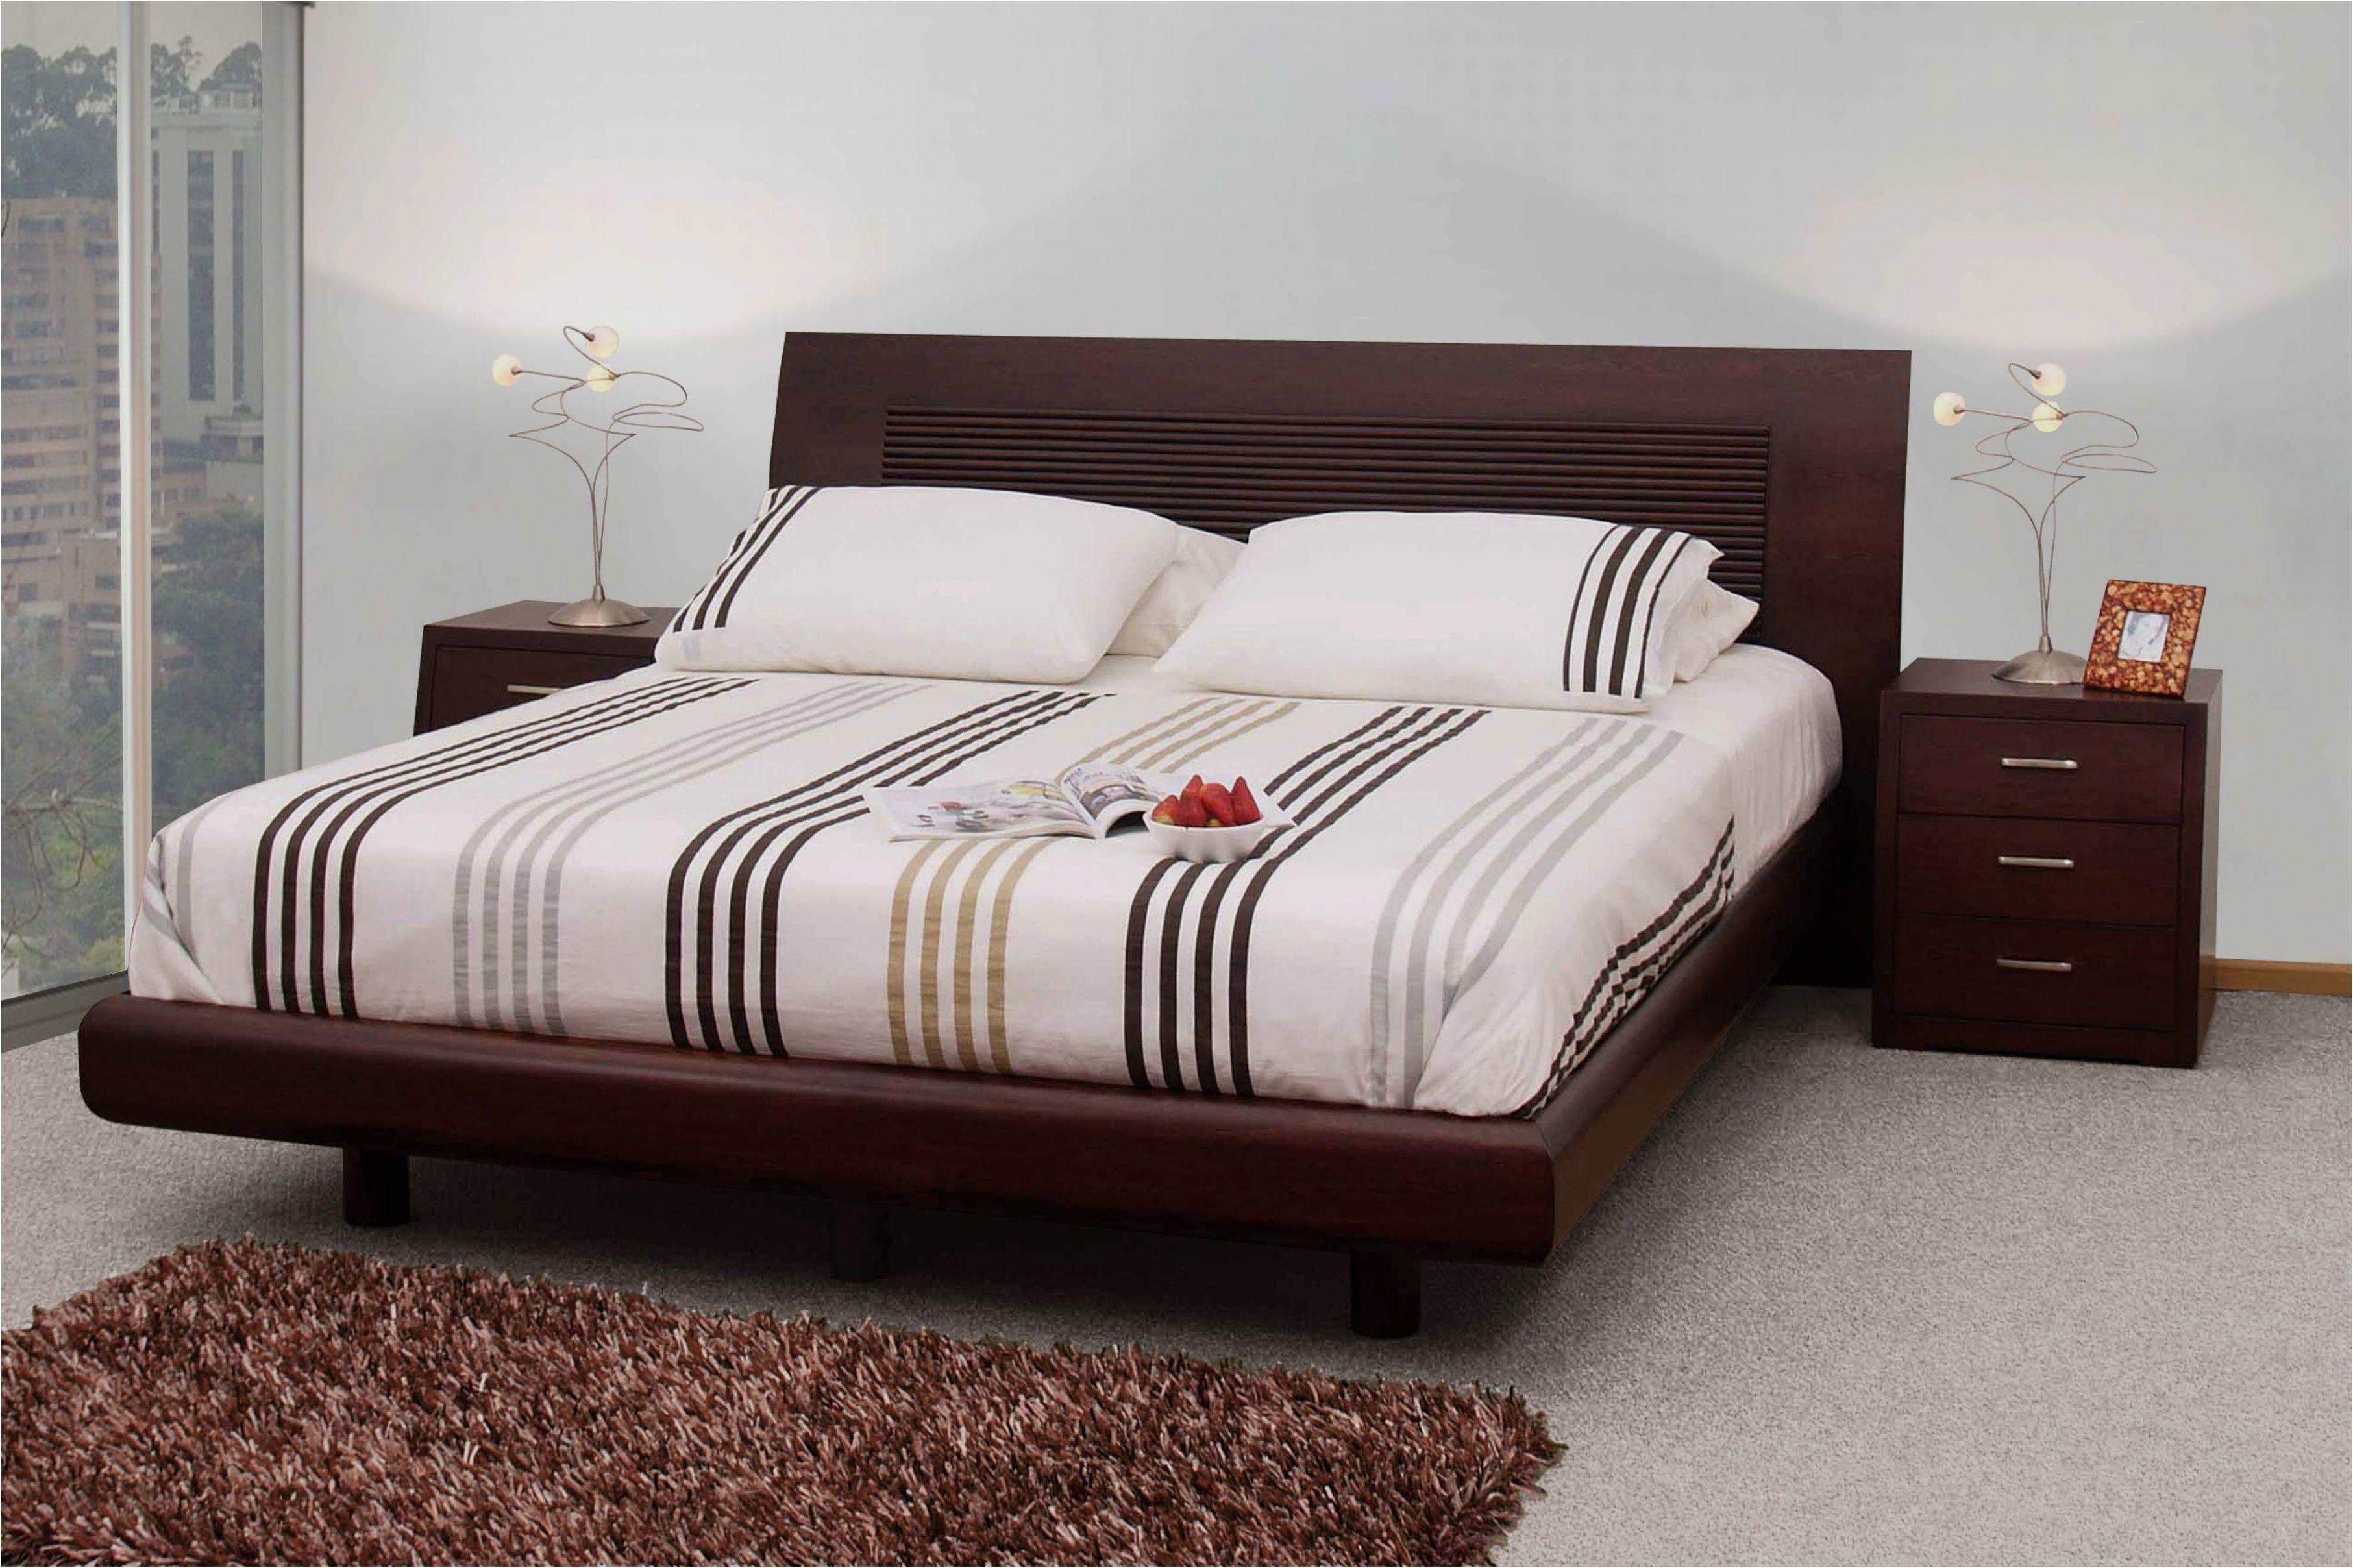 Cabeceras De Cama - Cabeceras De Cama De Madera Modernas | Bedroom bed design, Bed furniture design, Wooden bed design